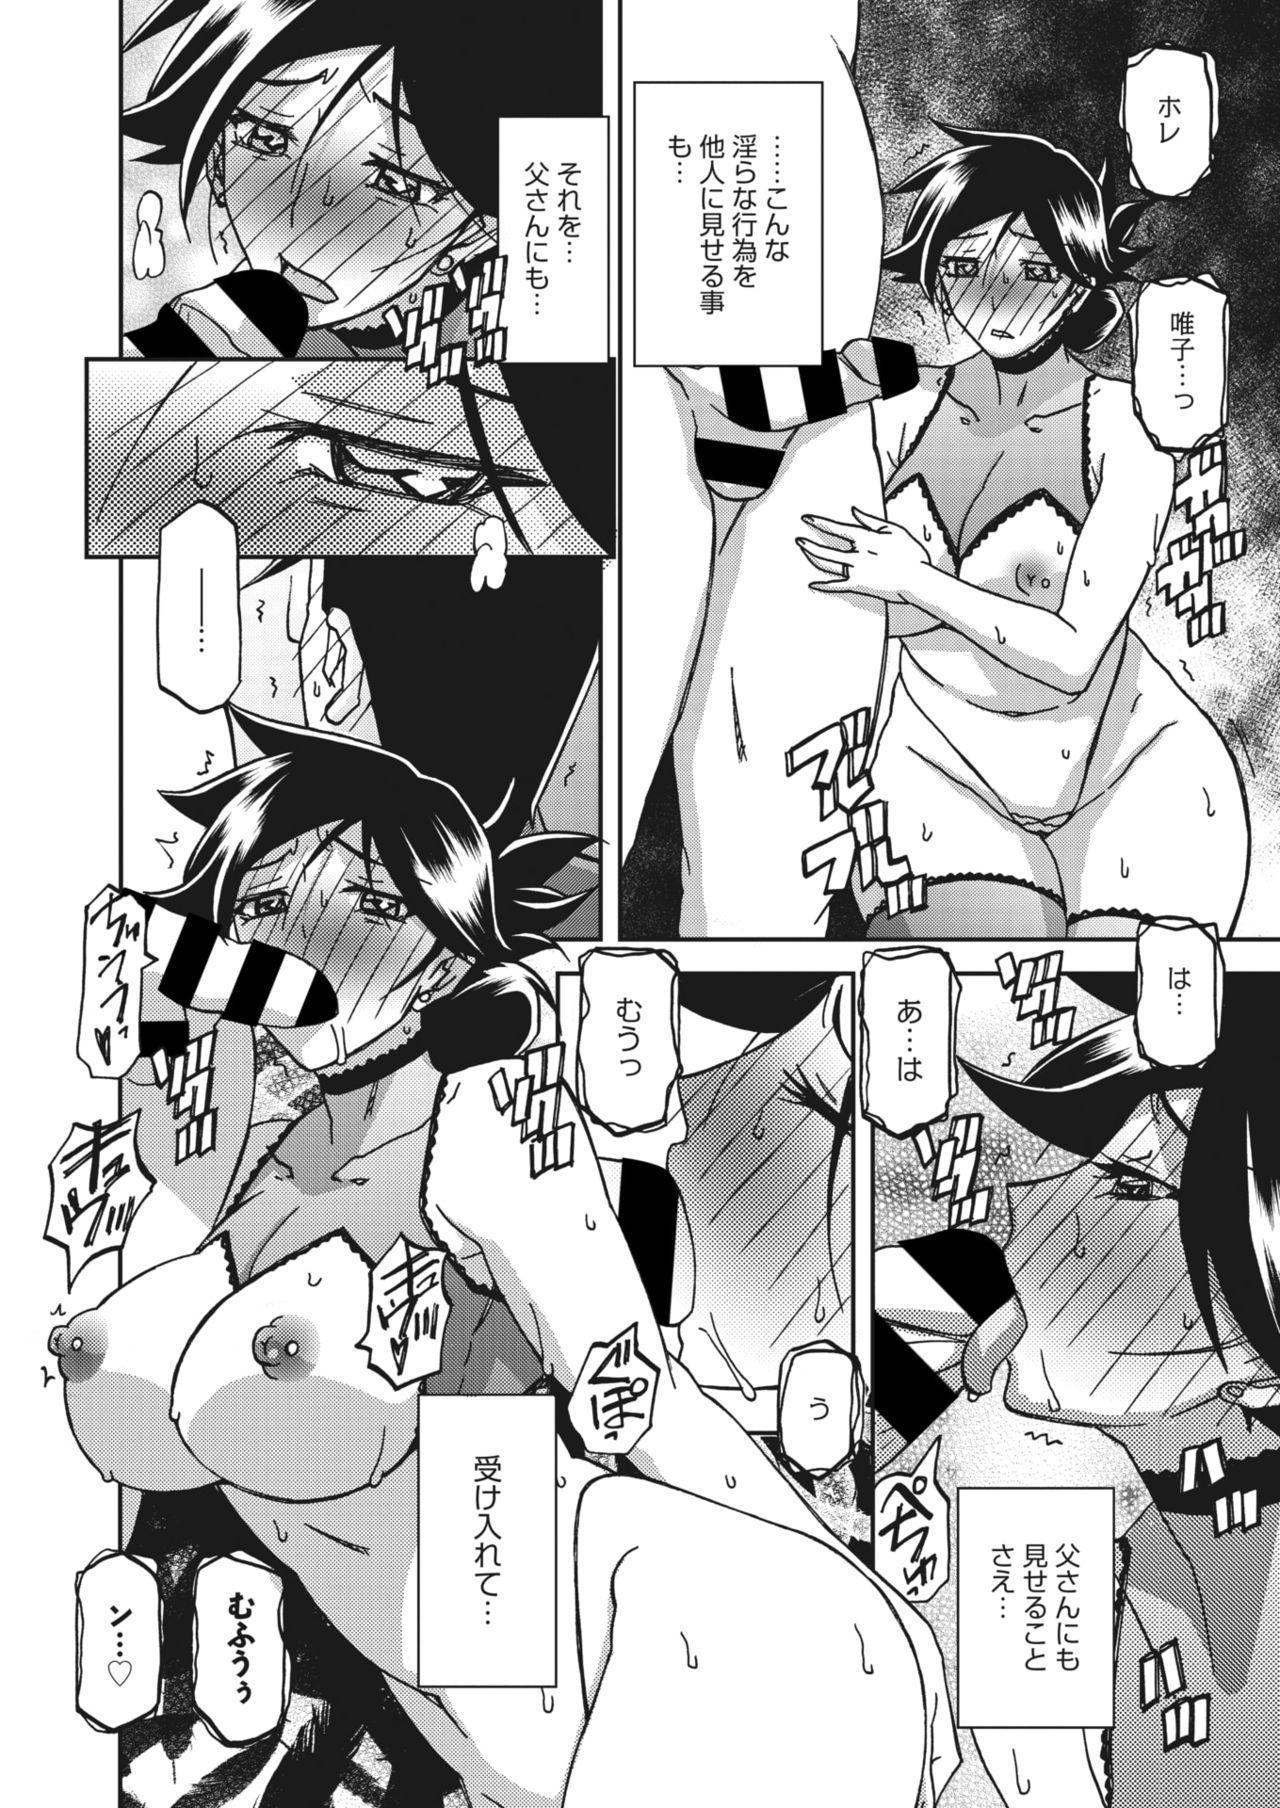 COMIC HOTMiLK Koime Vol. 21 142